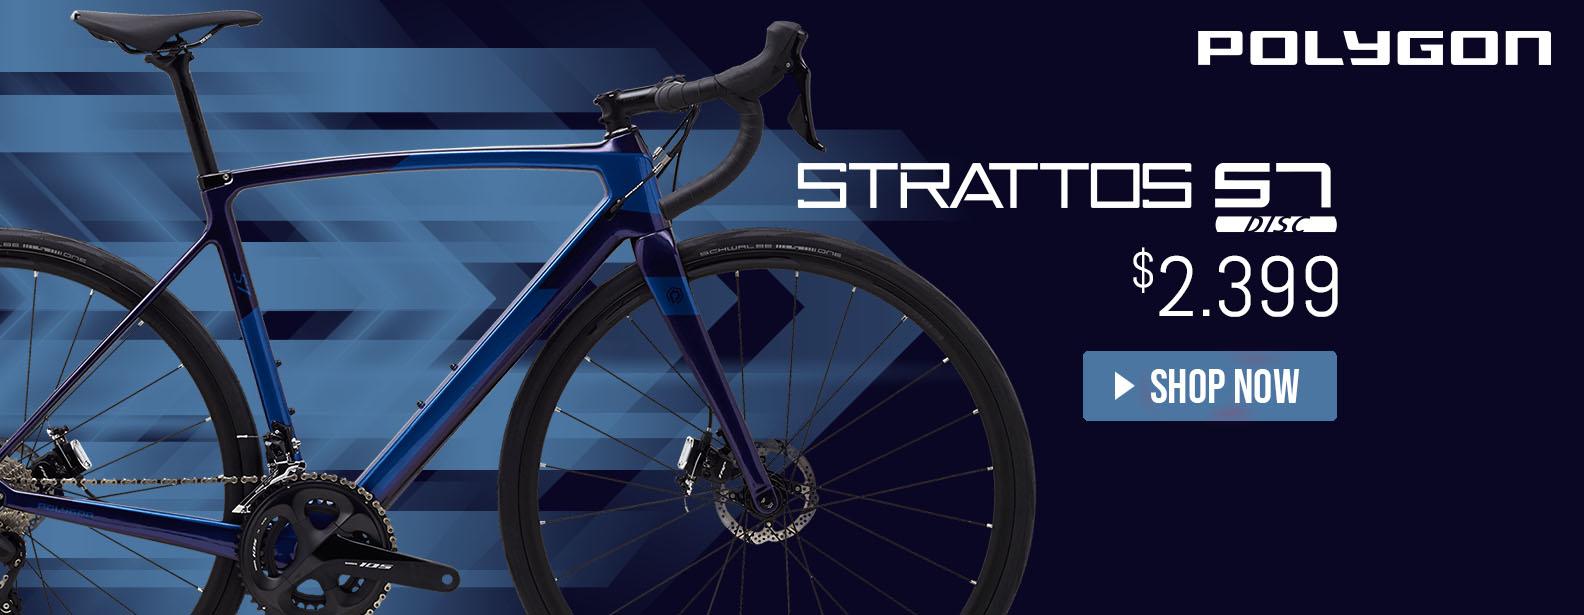 Polygon Strattos S7 Disc Road Bike